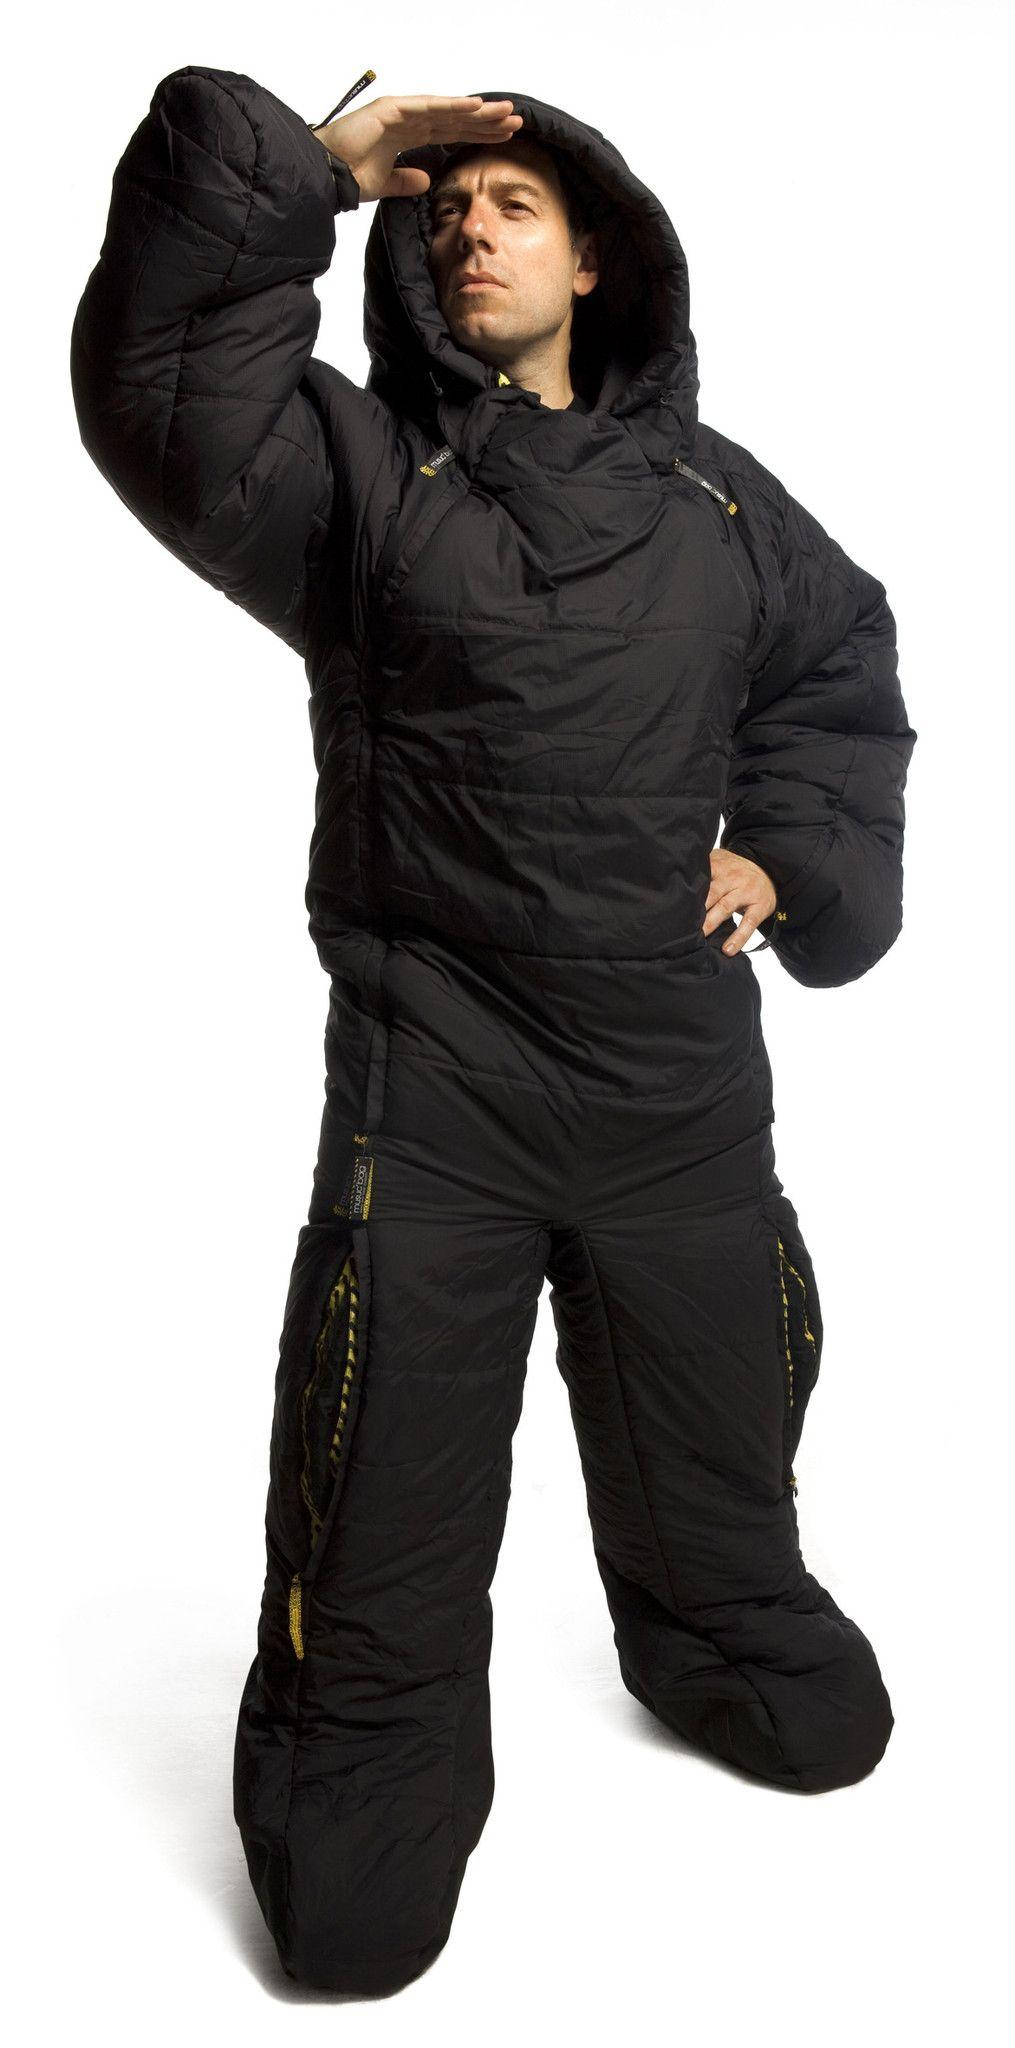 Selk Bag Sleeping Suit Original Black F Riders Inc